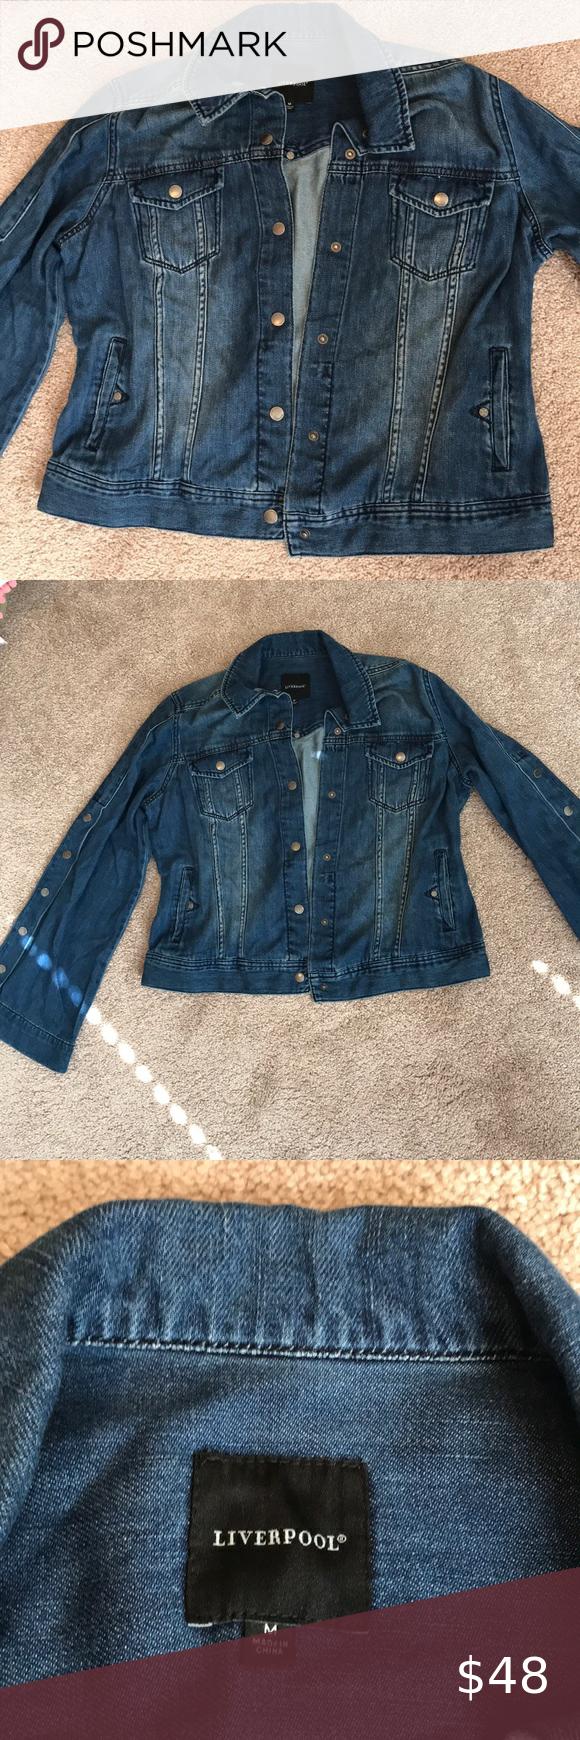 Bogo Jean Jacket Liverpool Jean Jacket Liverpool Jeans Jean Coat [ 1740 x 580 Pixel ]